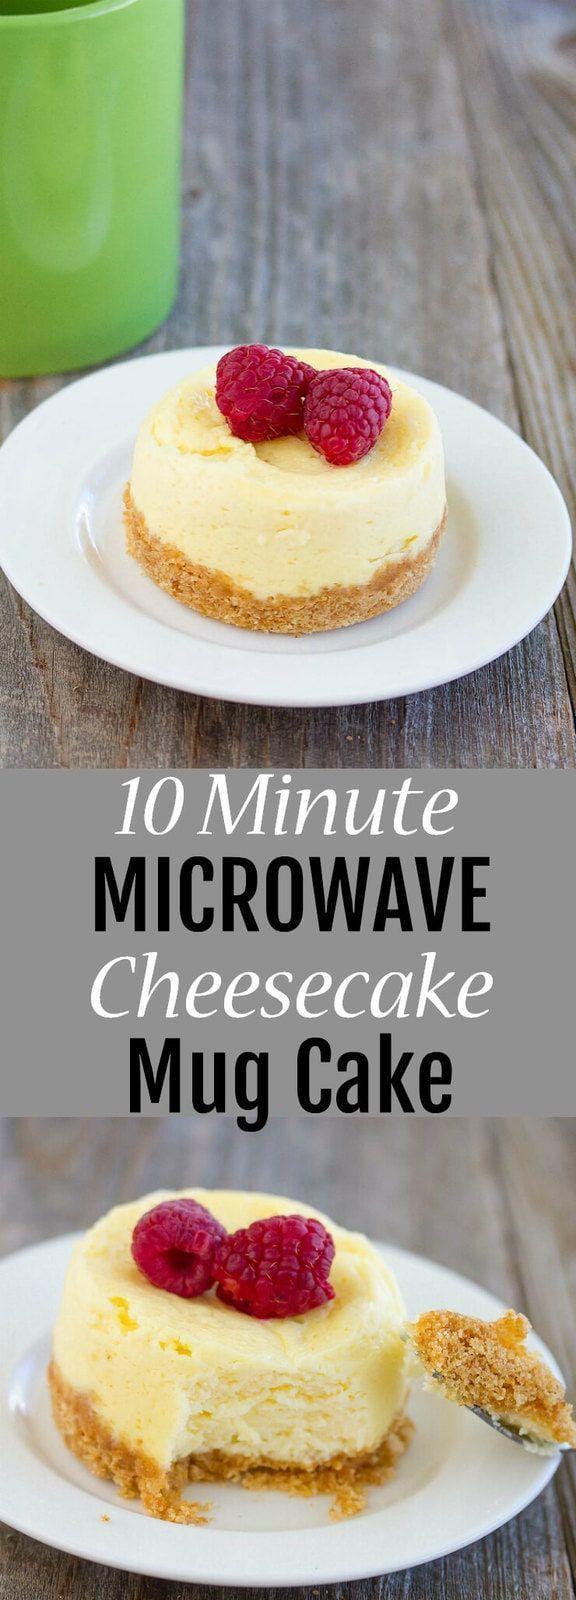 Microwave Cheesecake Mug Cake | Recipe | Microwave dessert ...